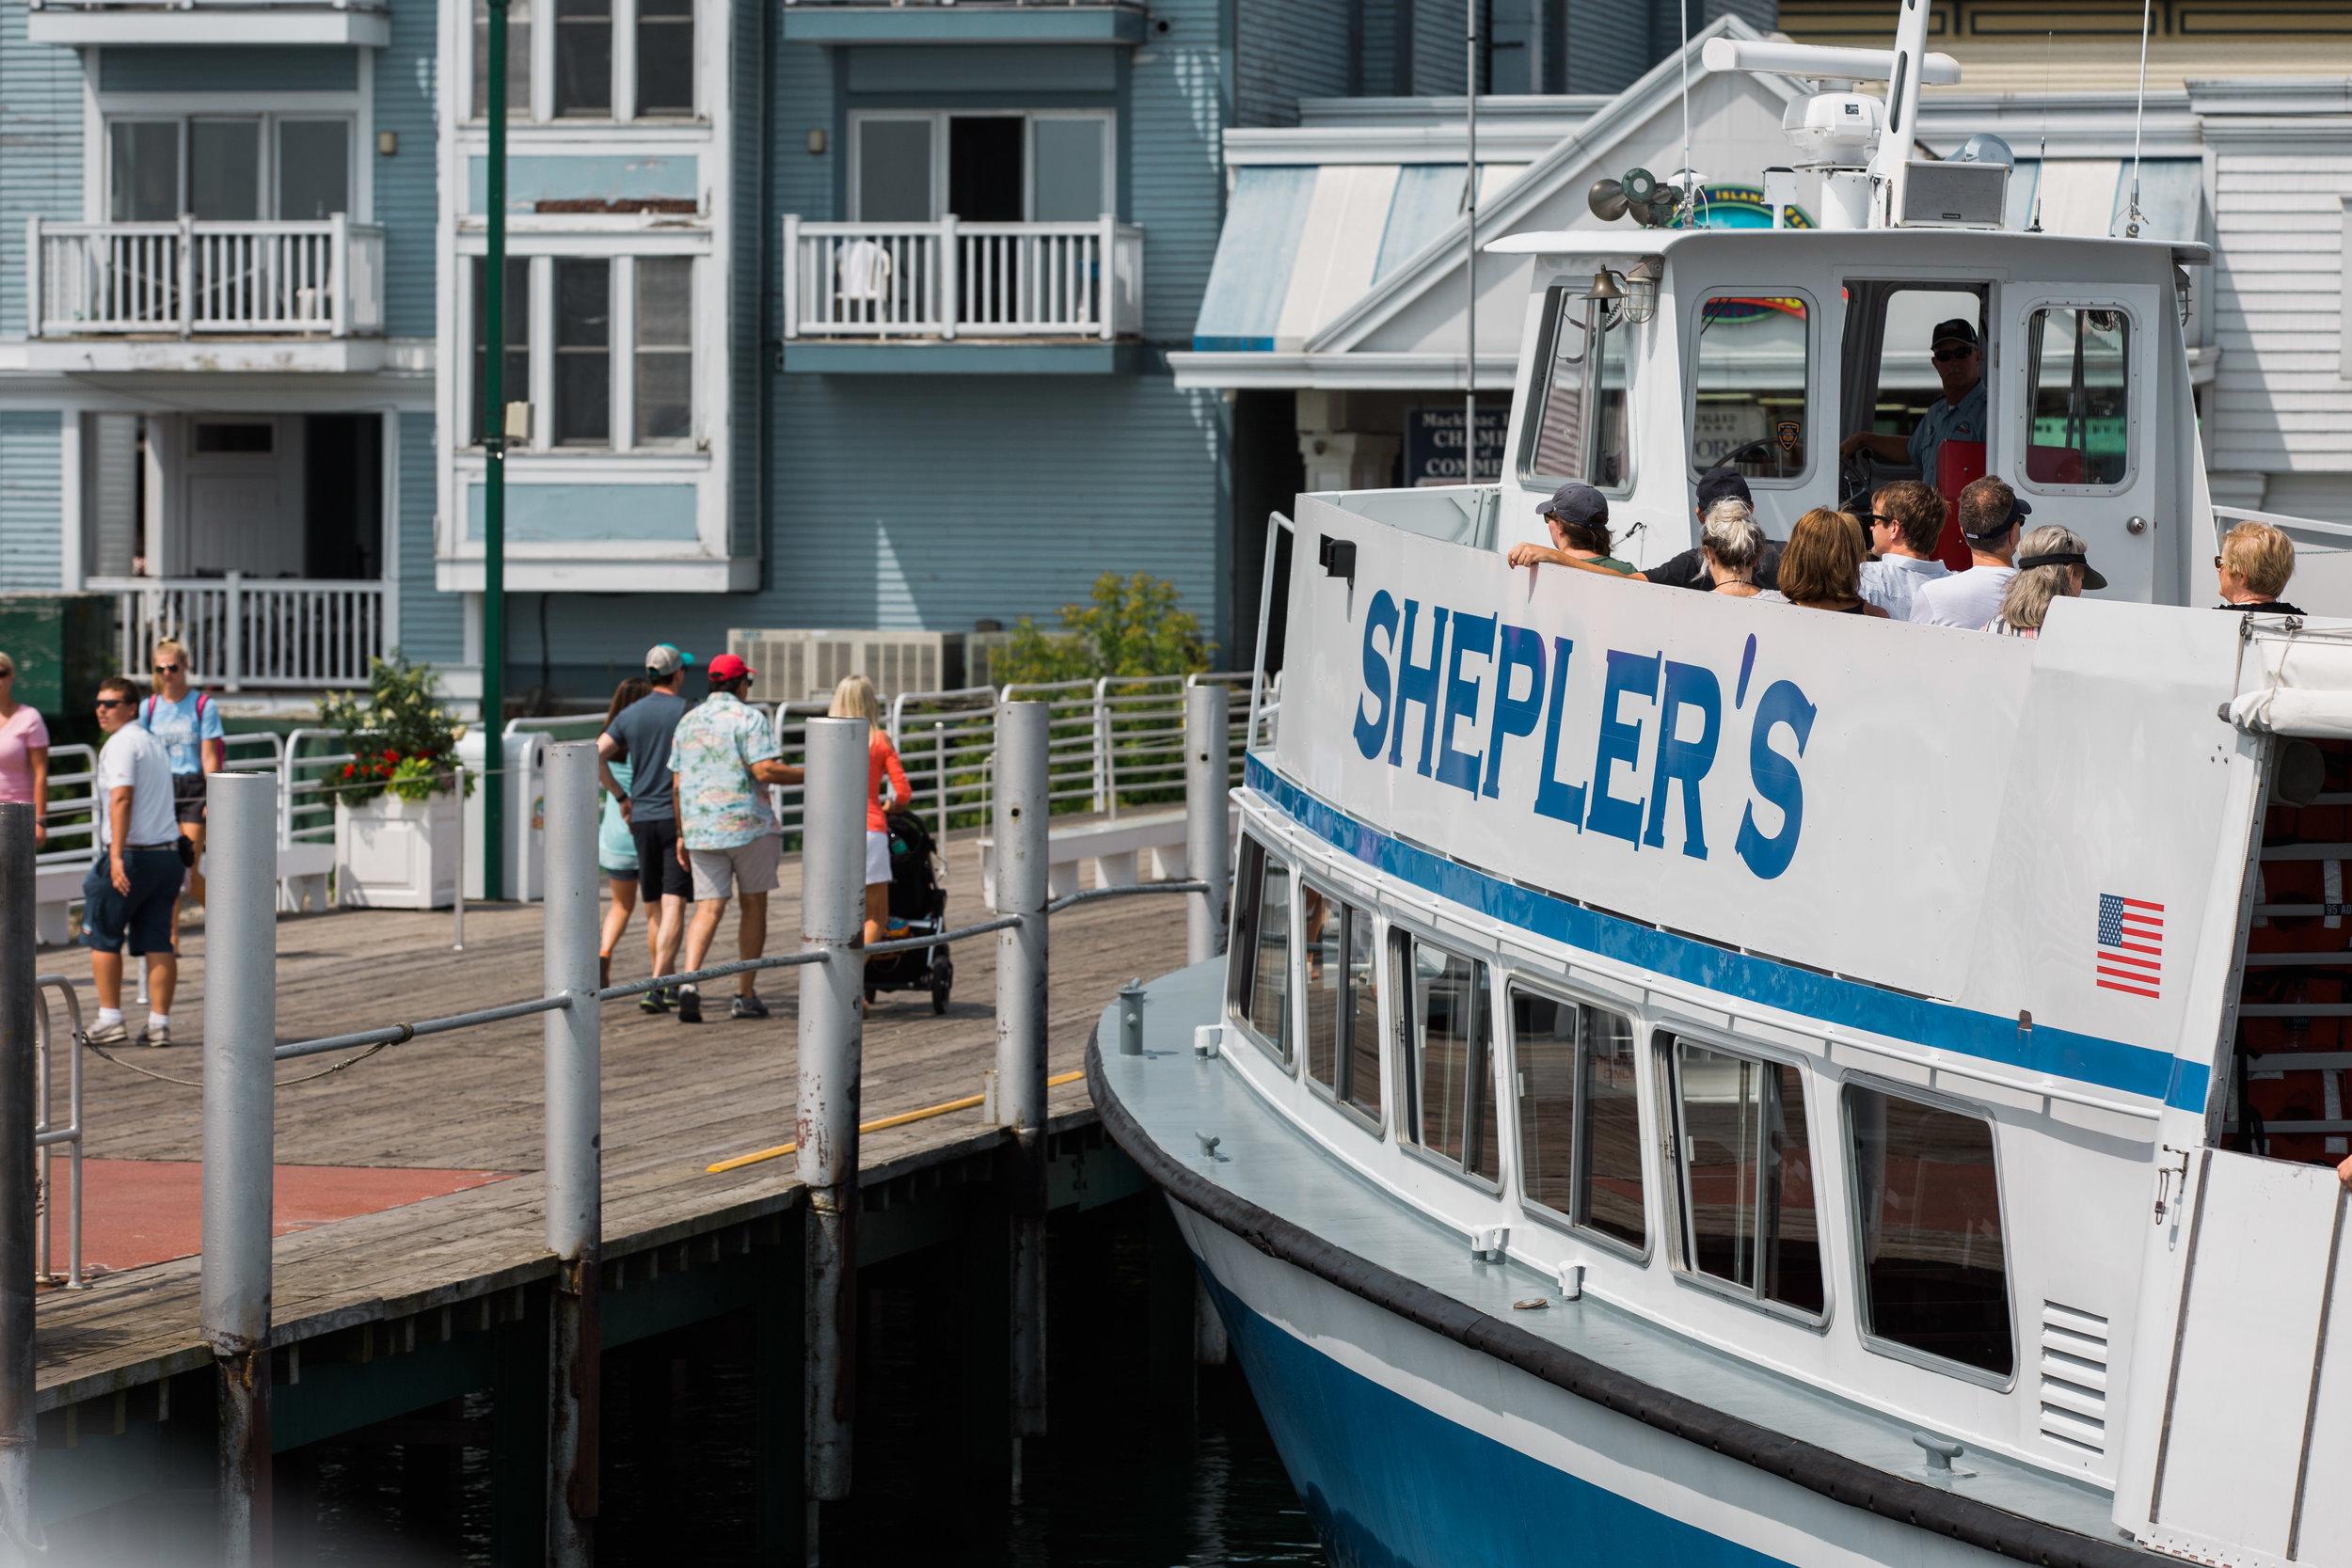 sheplers ferry mackinac